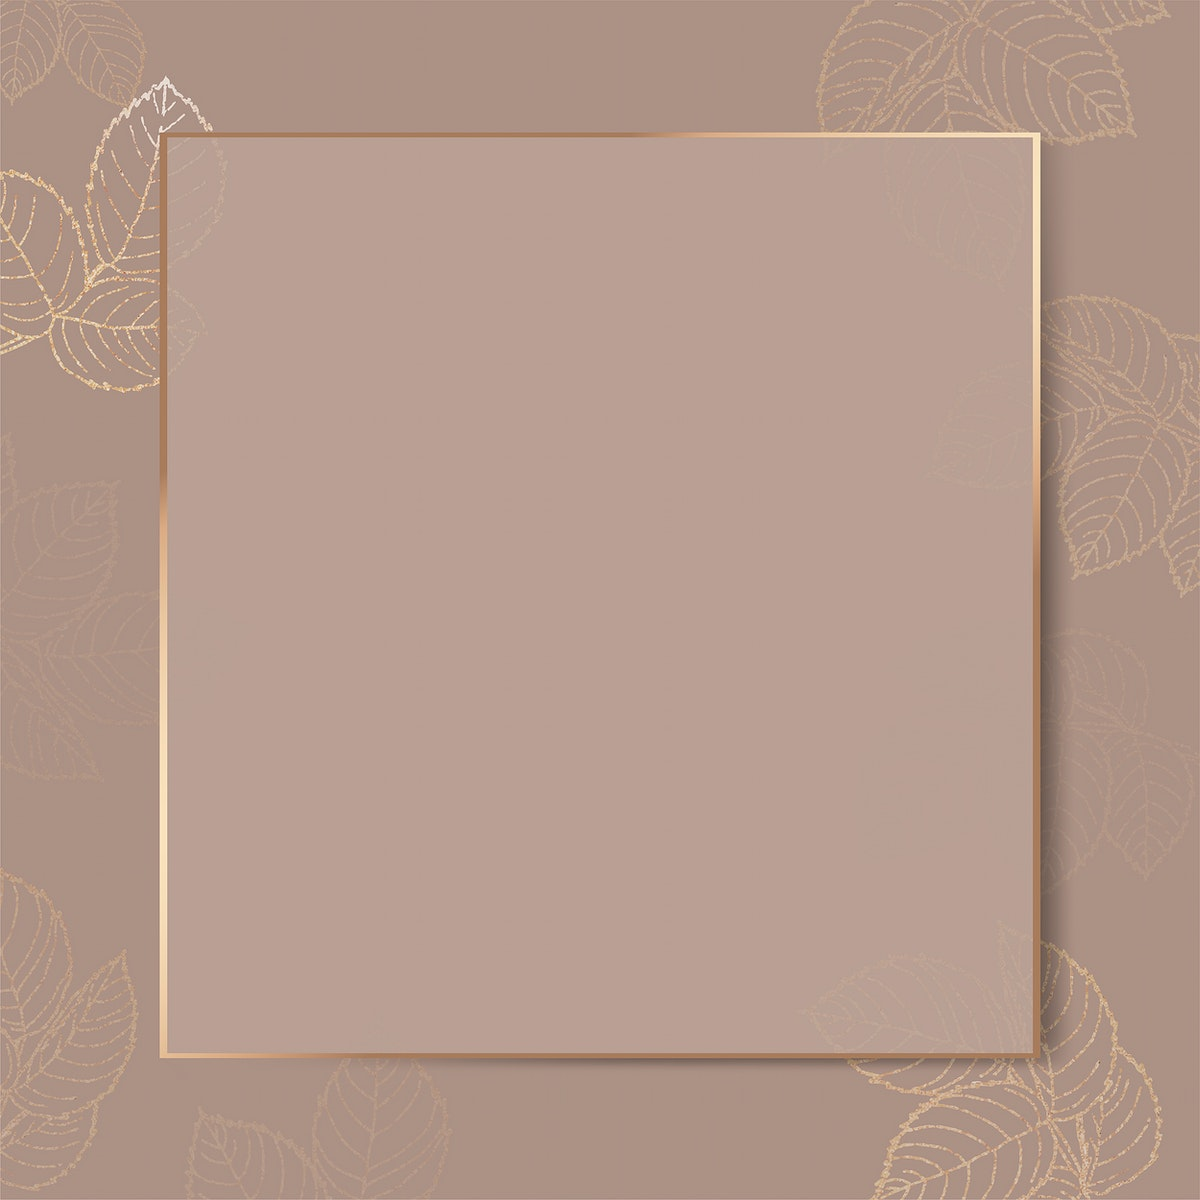 Blank golden leafy frame vector